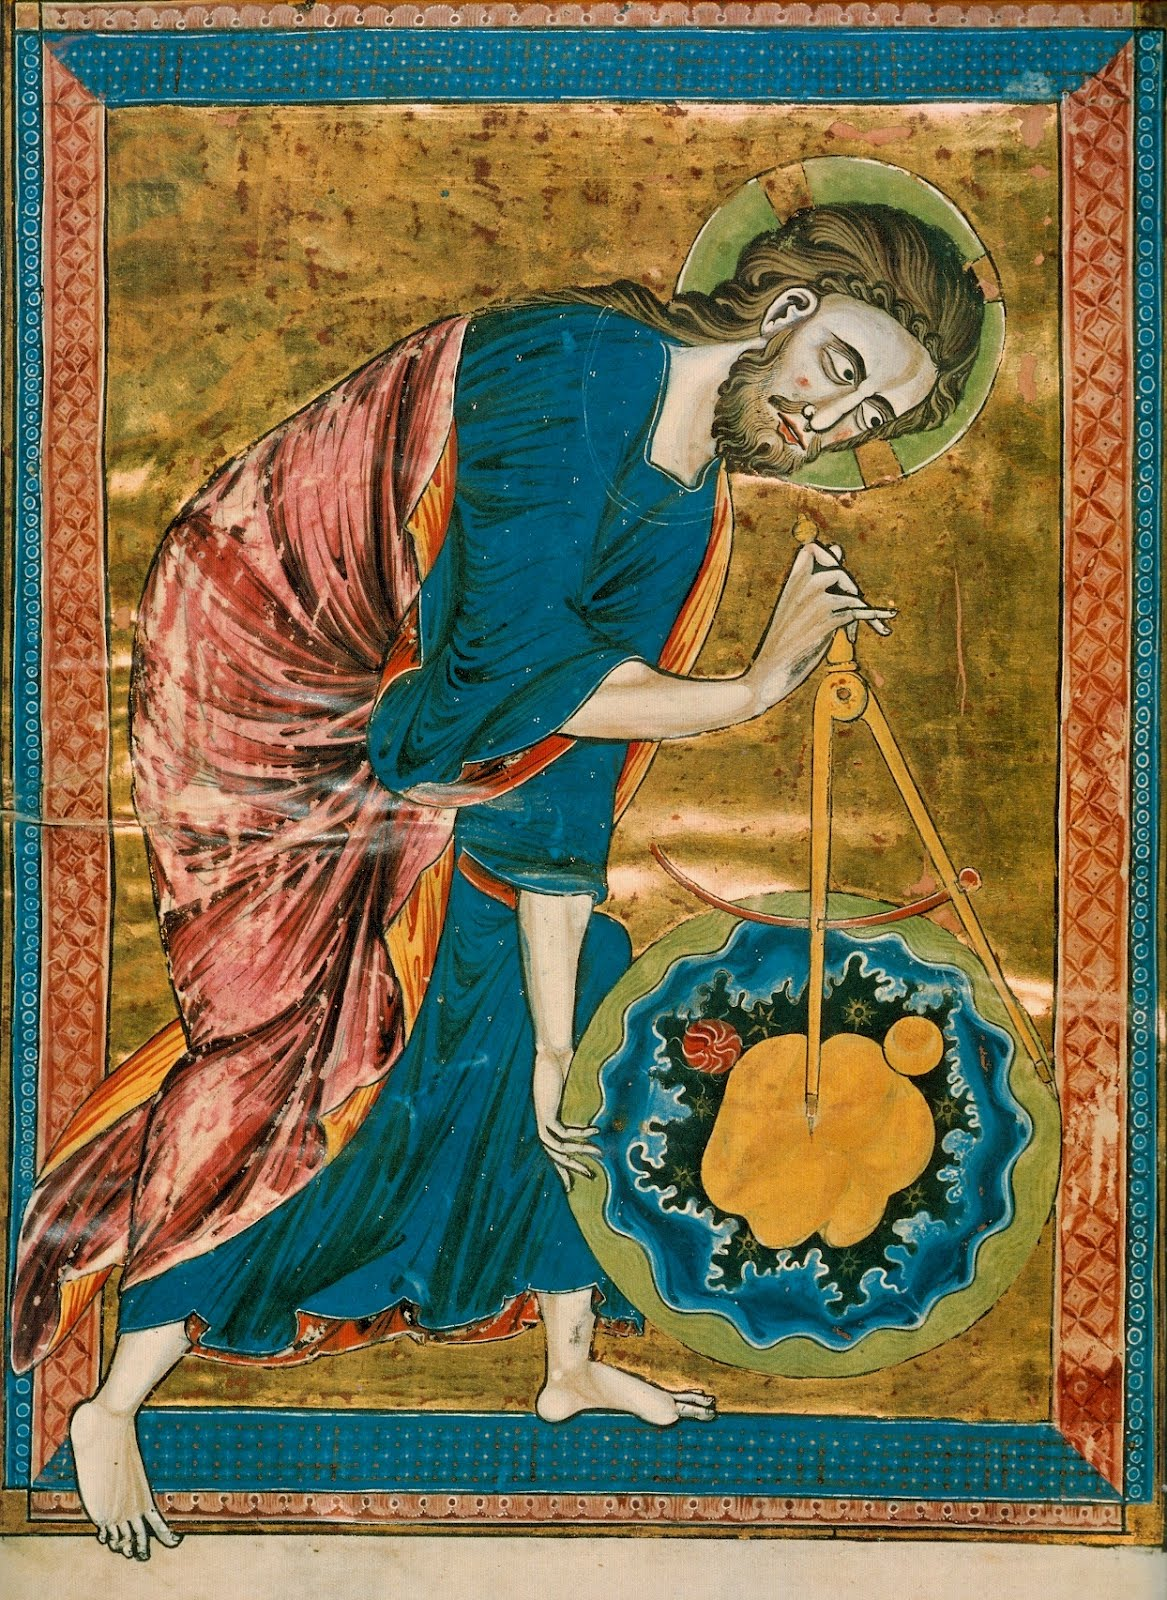 God the Geometer. Codex Vindobonensis, ca 1250.